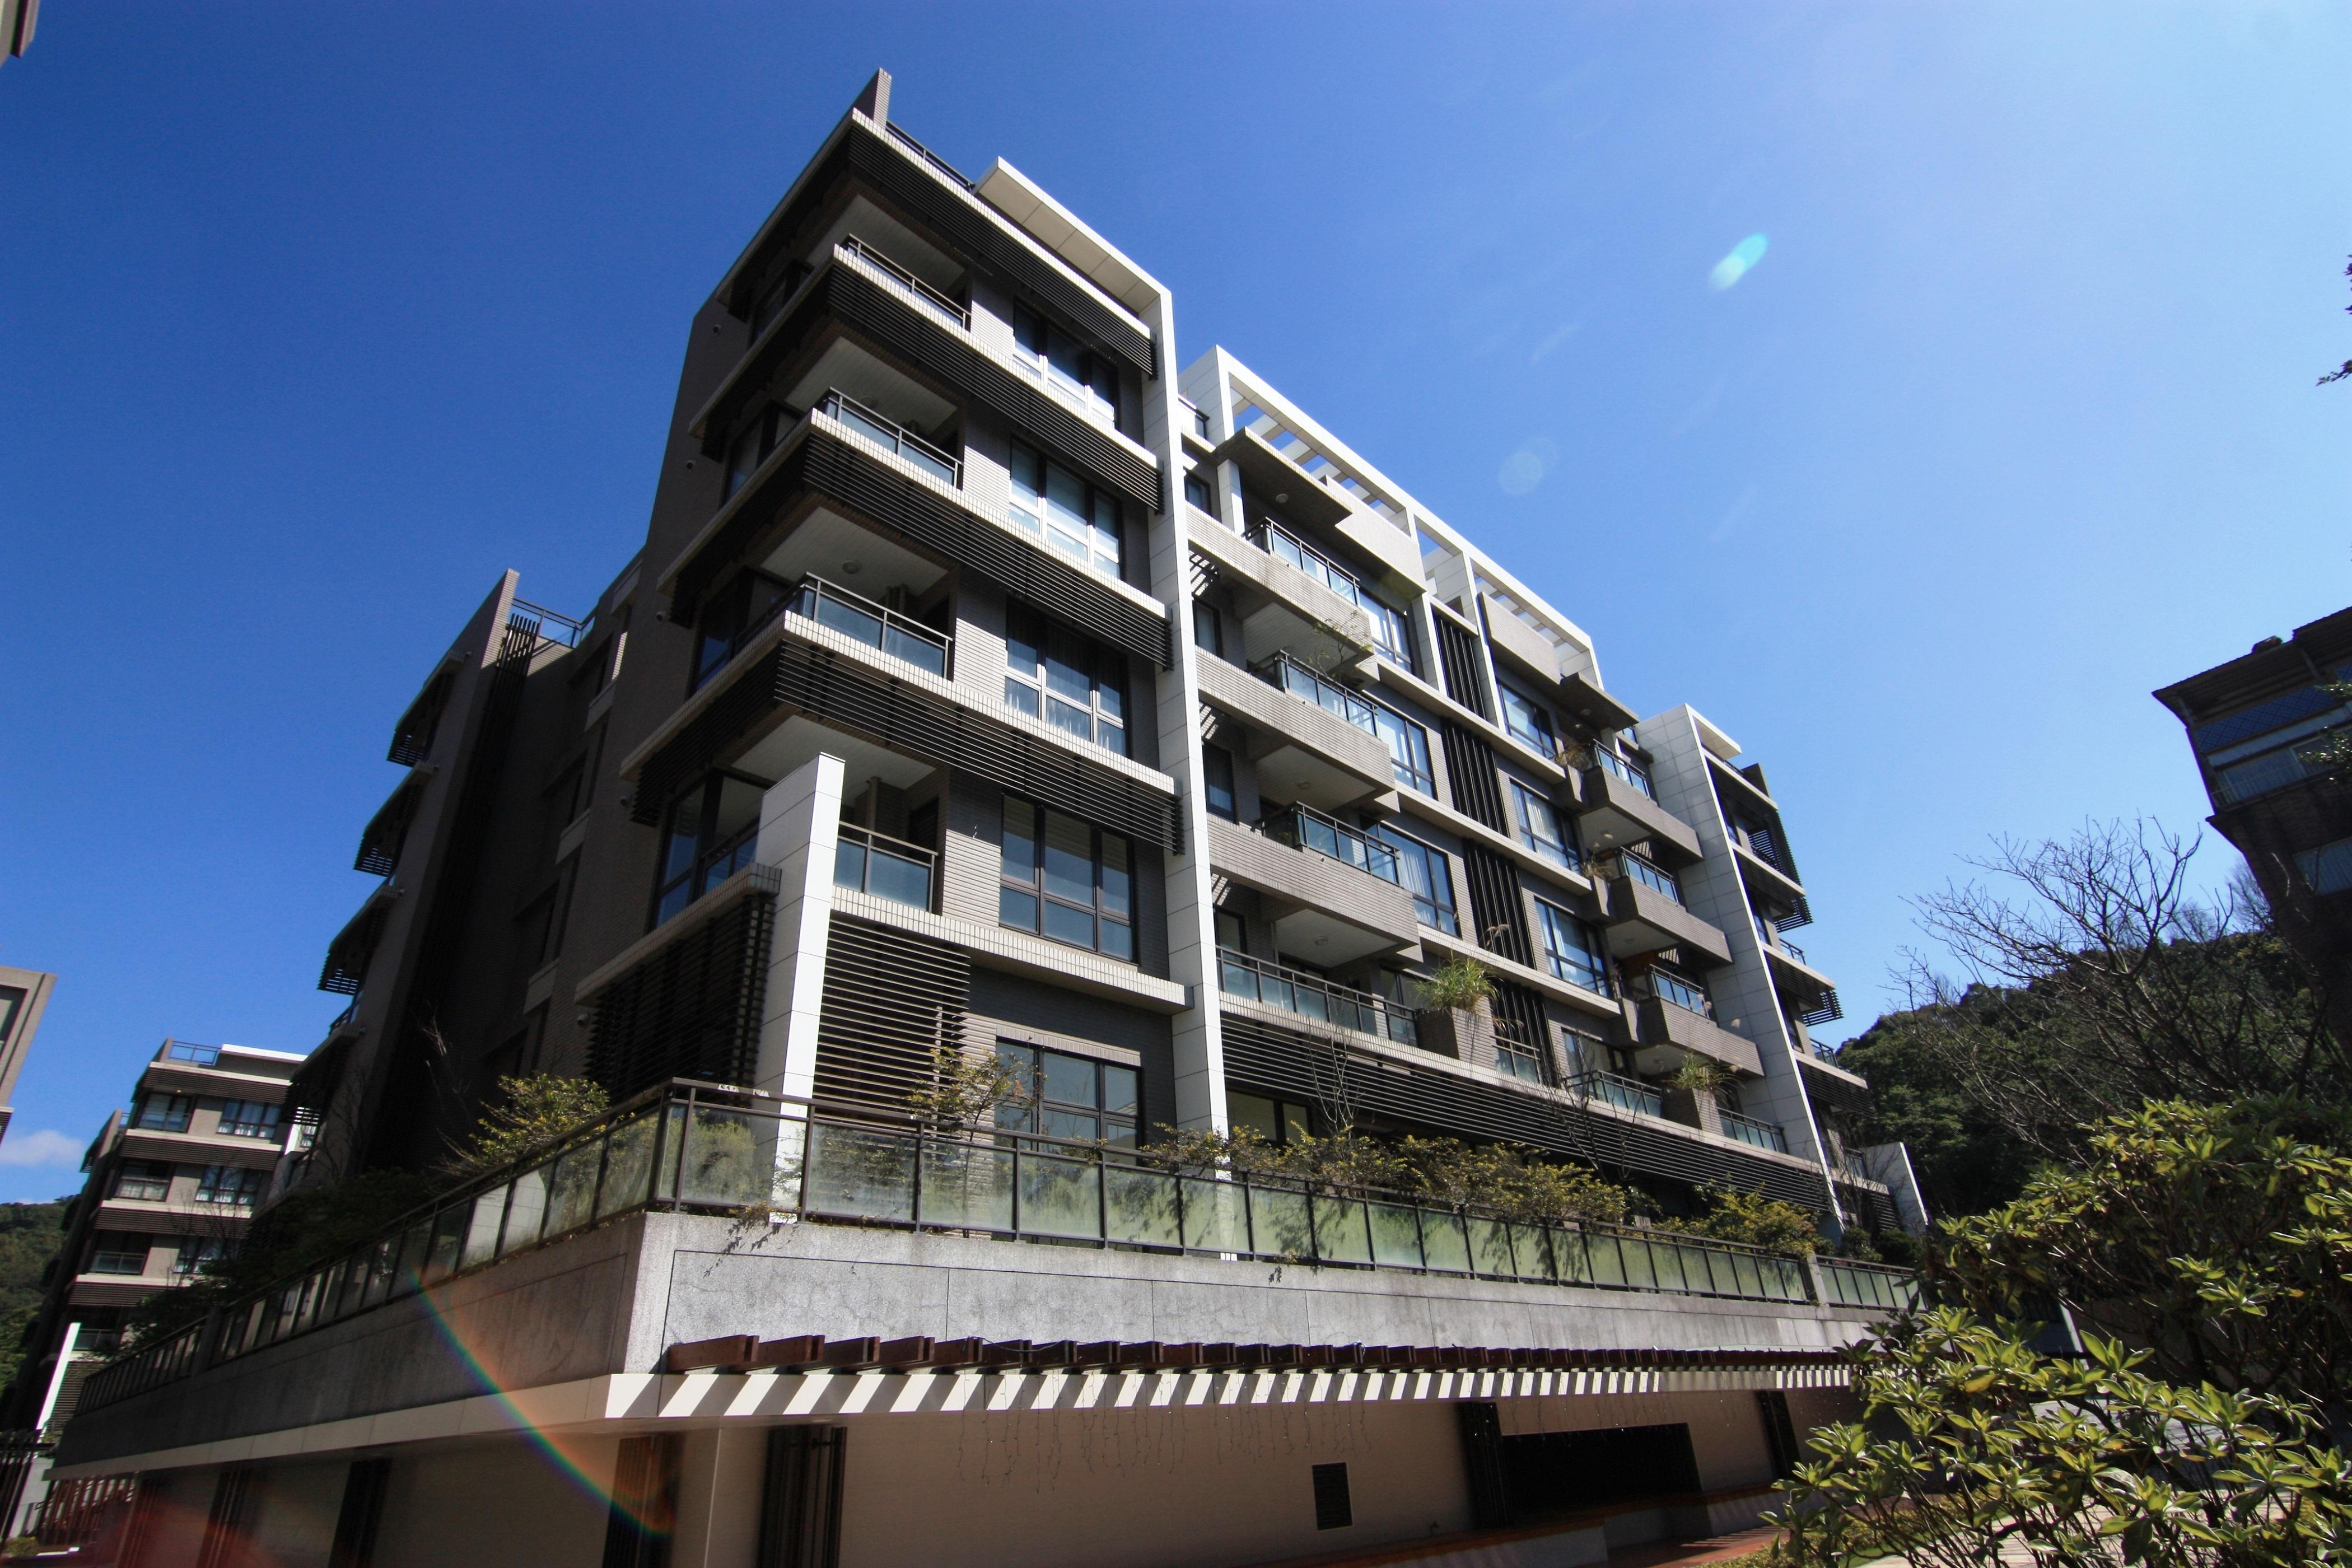 Apartamento por un Venta en The Emperor-Park 1 Jingshan Rd., Shilin Dist. Taipei City, 111 Taiwan